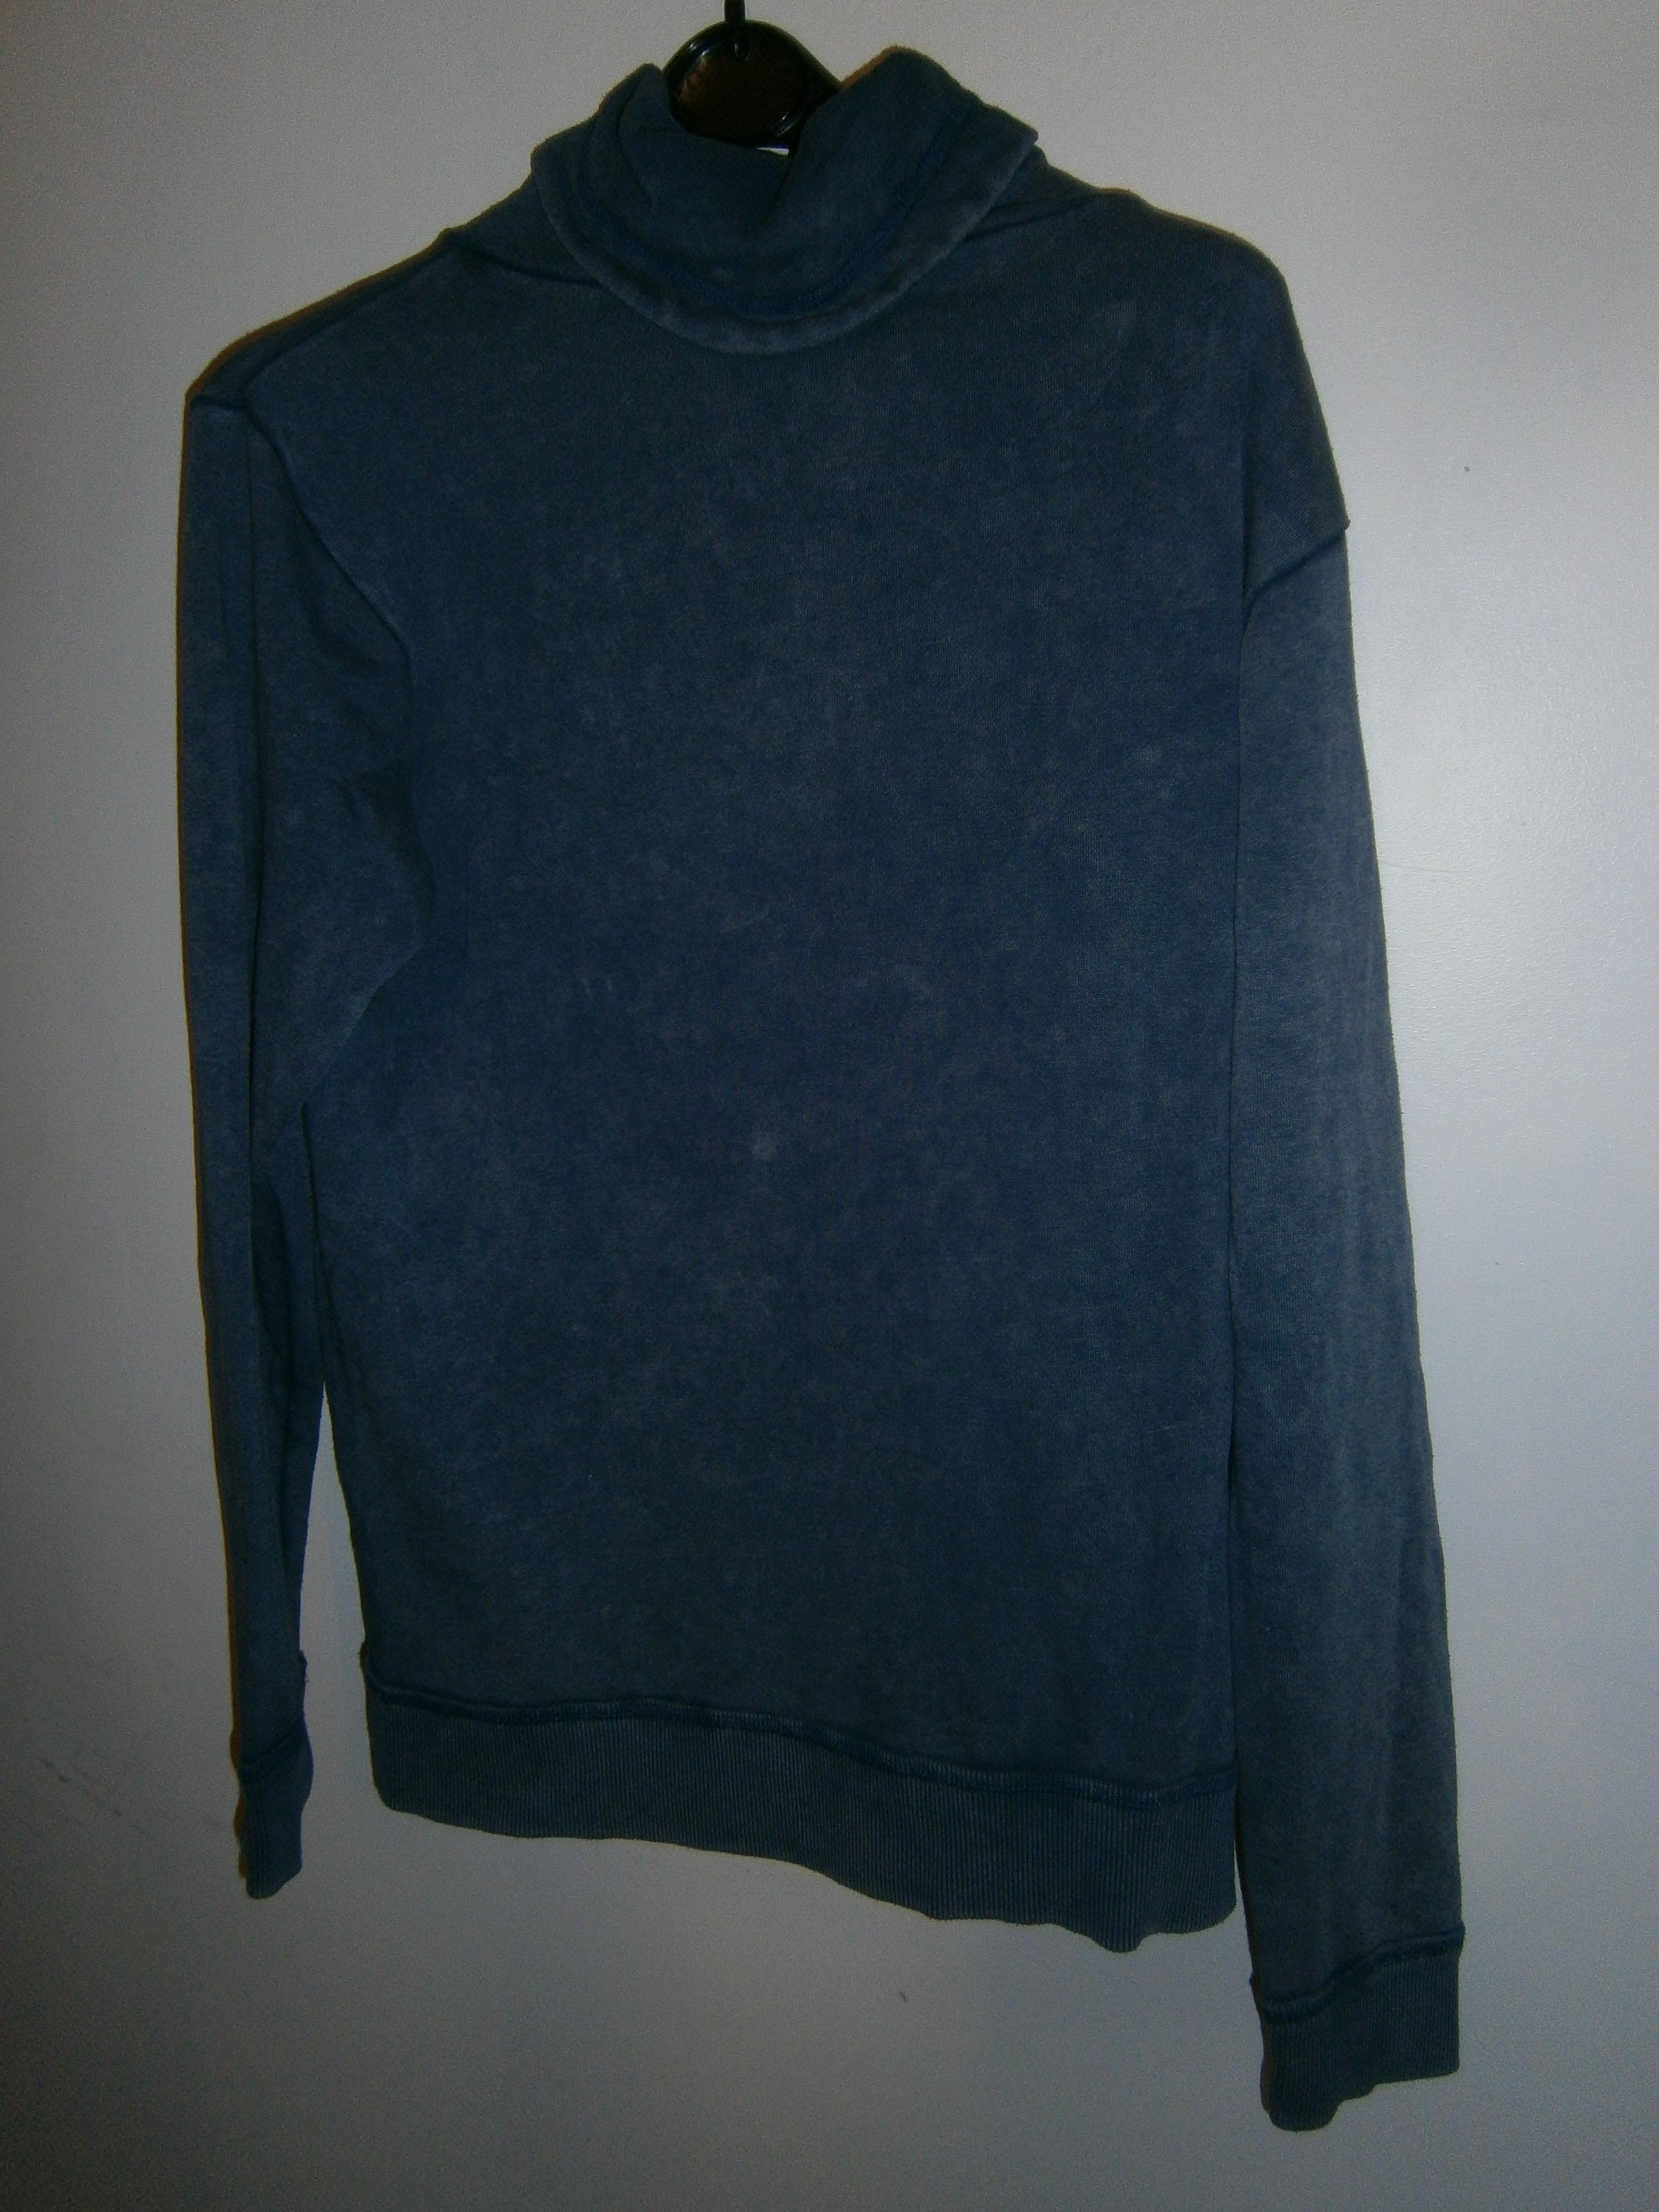 troc de troc sweat shirt s kiabi image 2